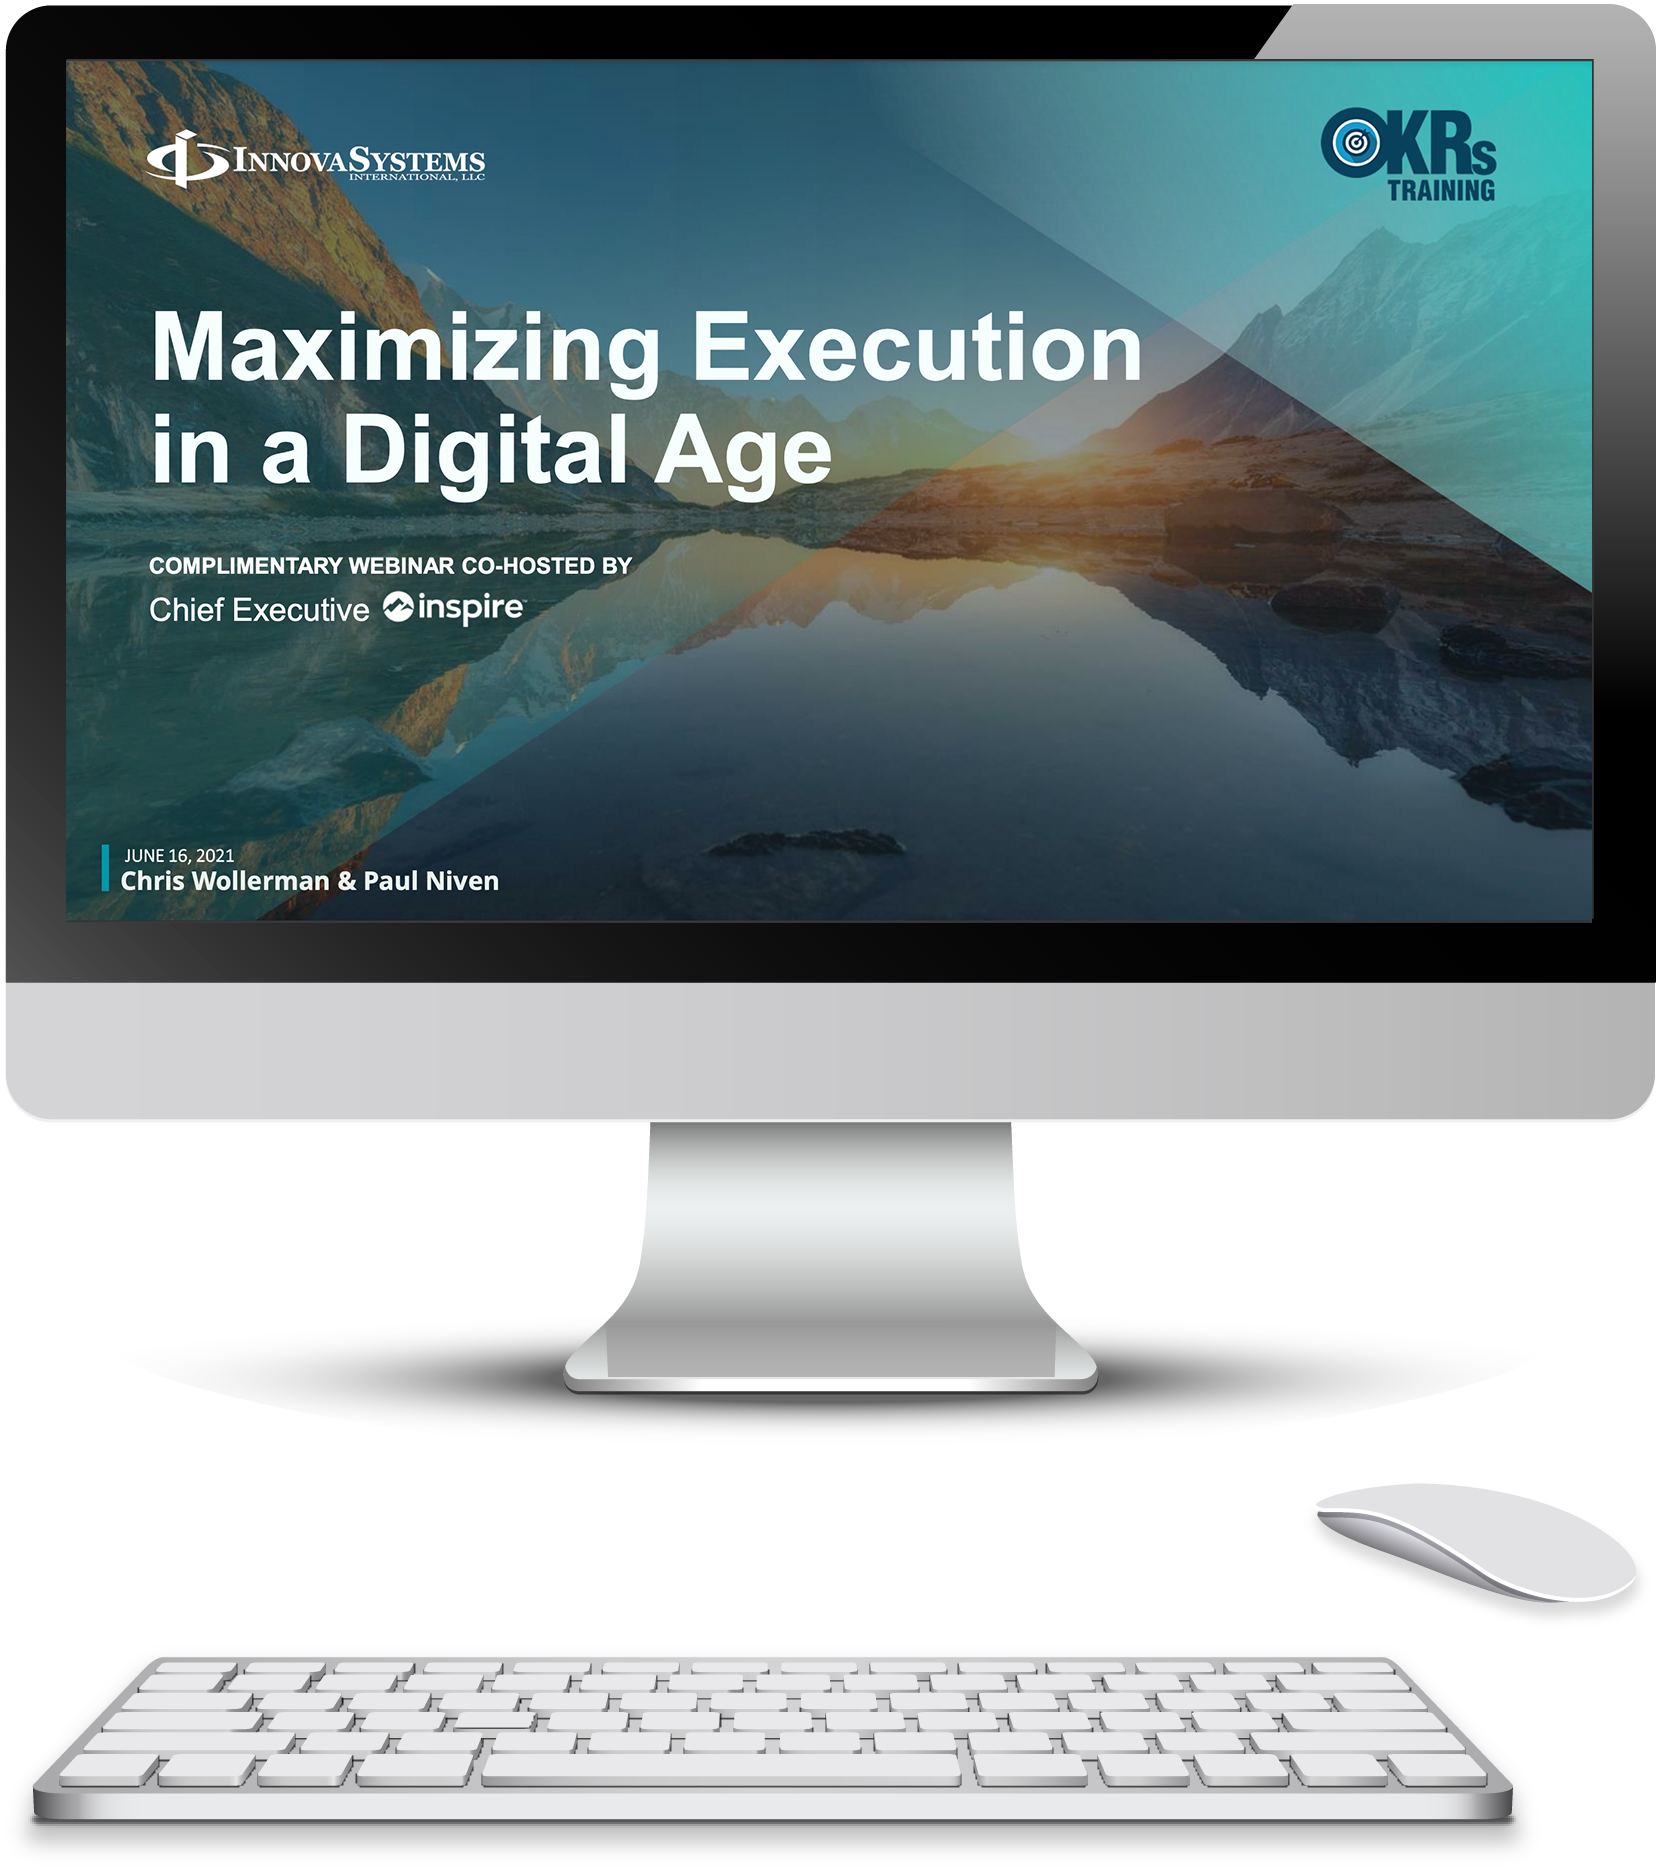 Webinar-Mockup-Maximize-Execution-Digital-Age